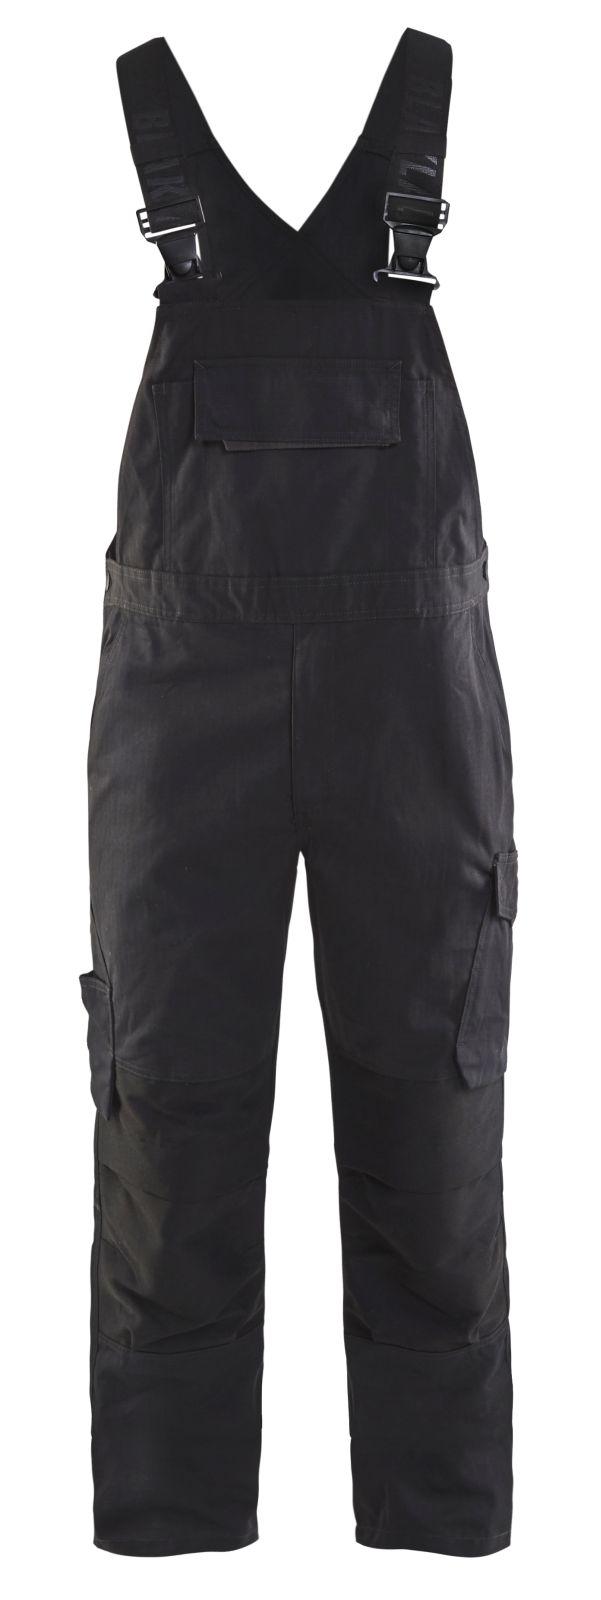 Blaklader Am. Overalls 26951330 met Stretch zwart-grijs(9998)